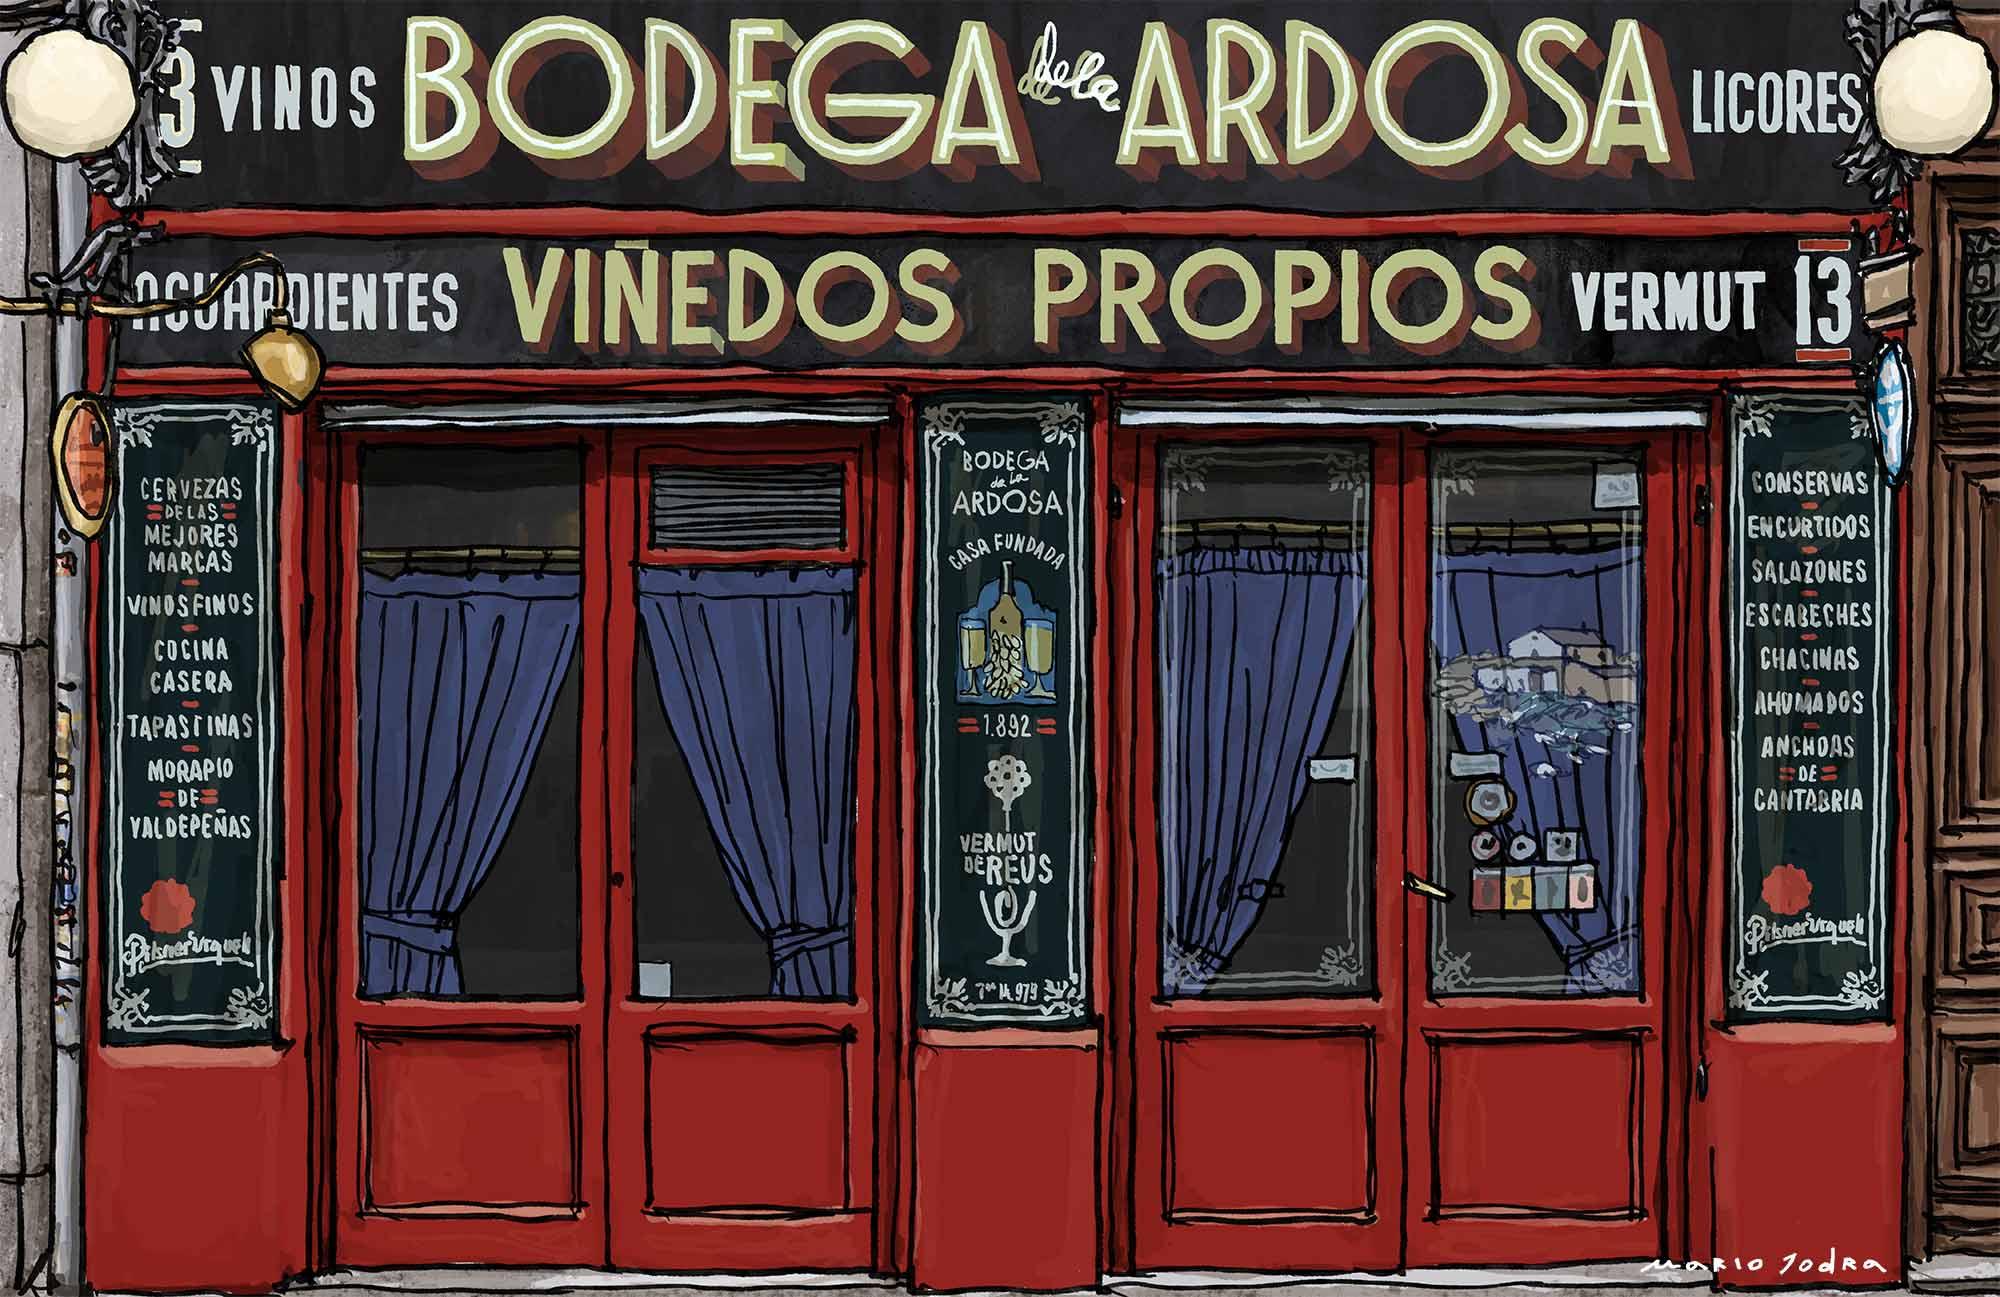 Mario Jodra illustration Art - Bodega de la Ardosa. Madrid tavern. Since 1892